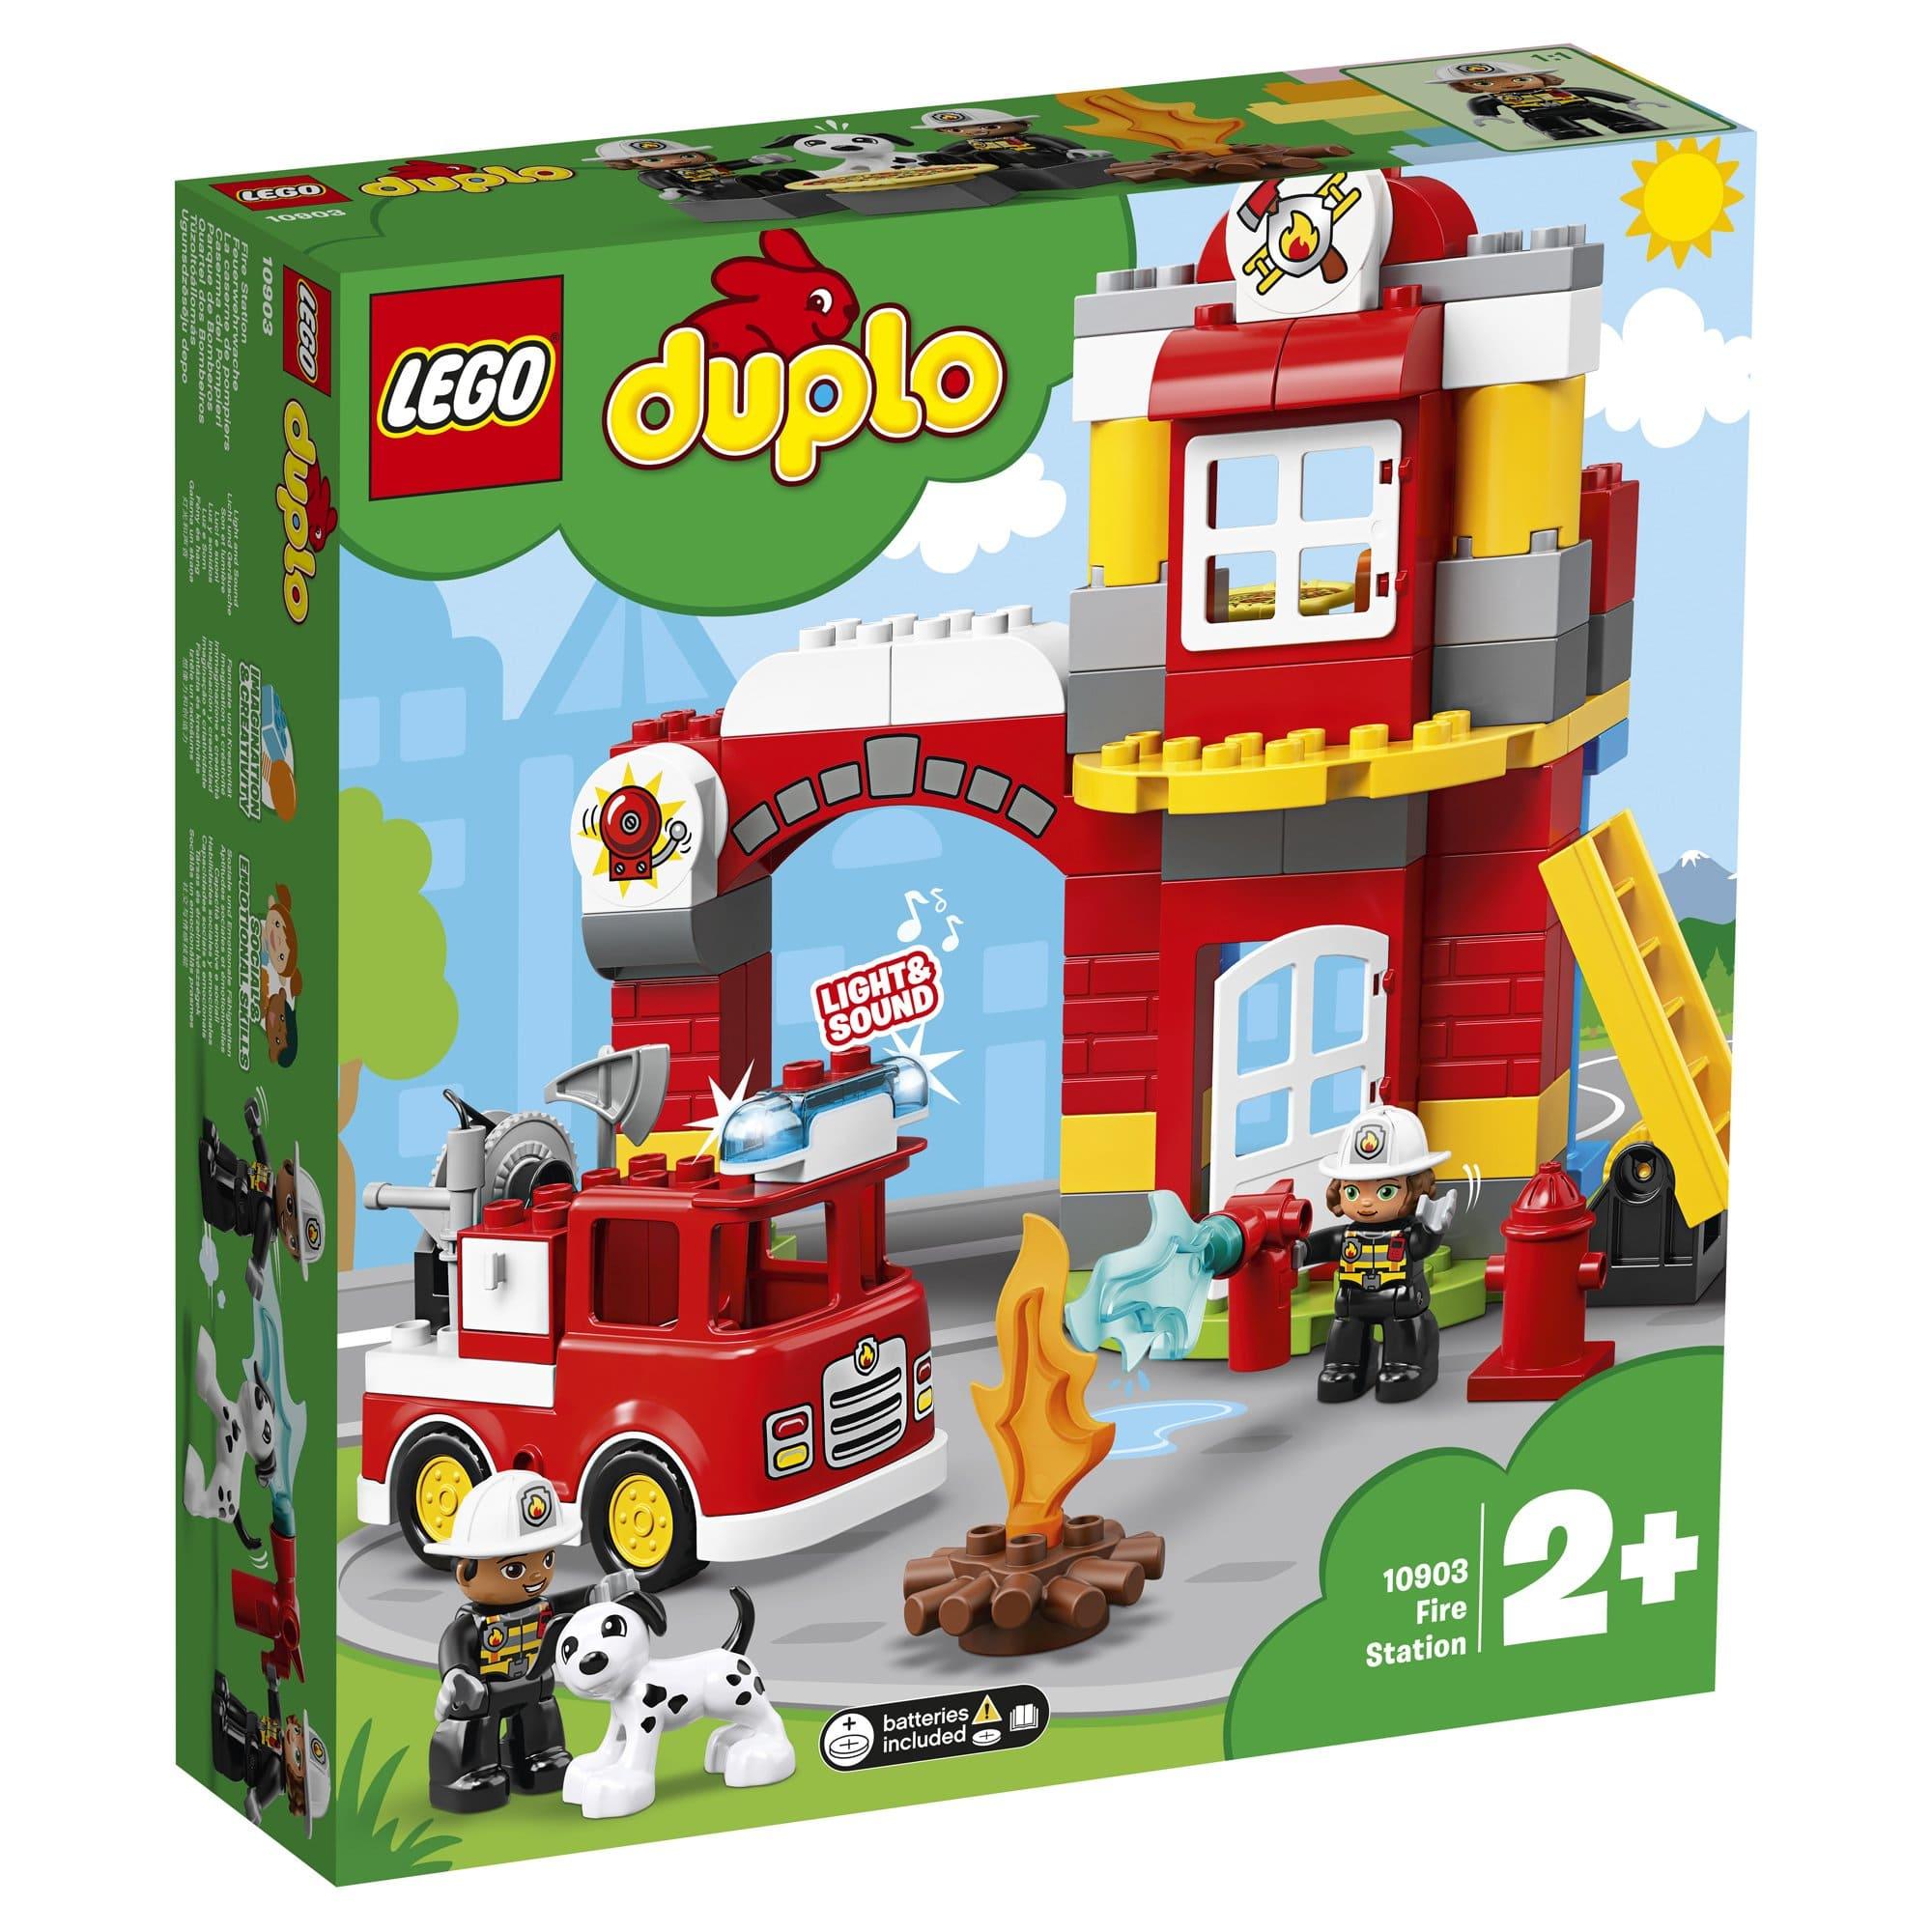 LEGO 樂高積木 DUPLO Town 10903 消防局